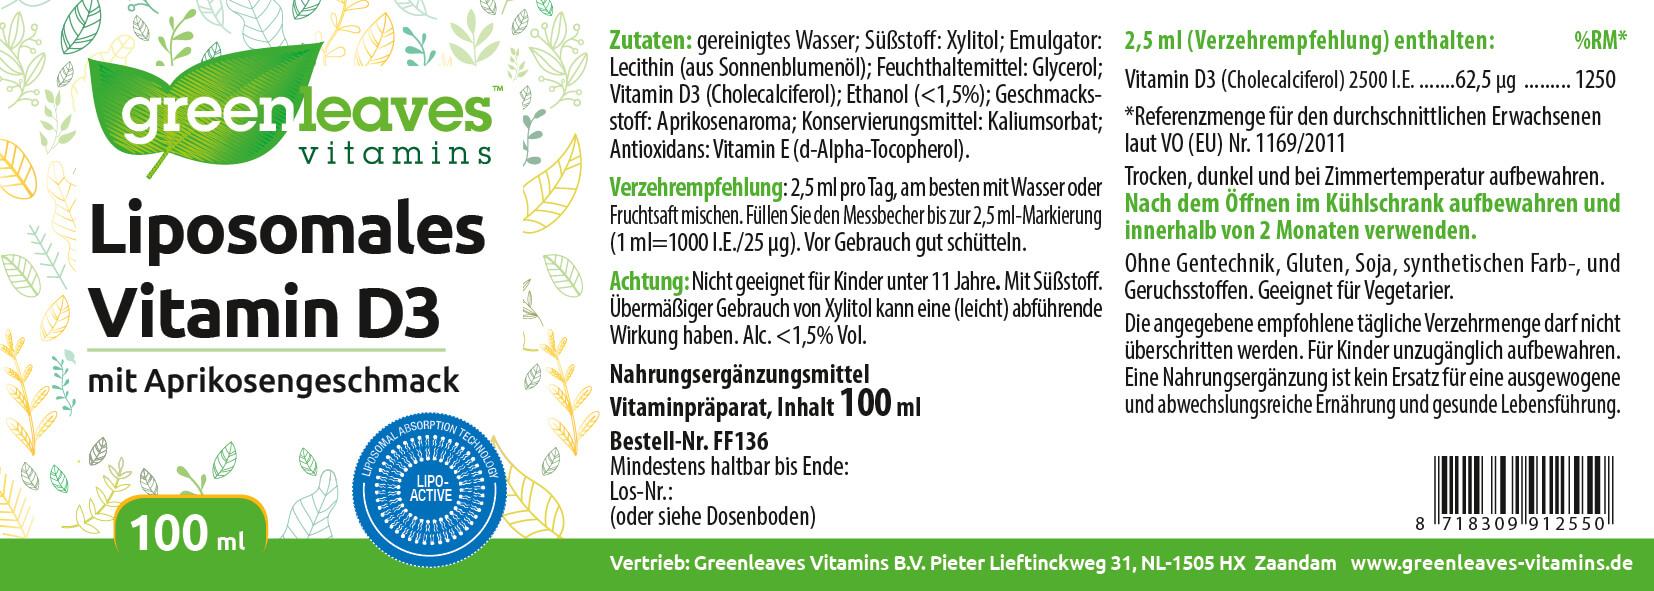 FF136-Liposomales-Vitamin-D3-100-mgfpxgdgvsj8Fb7